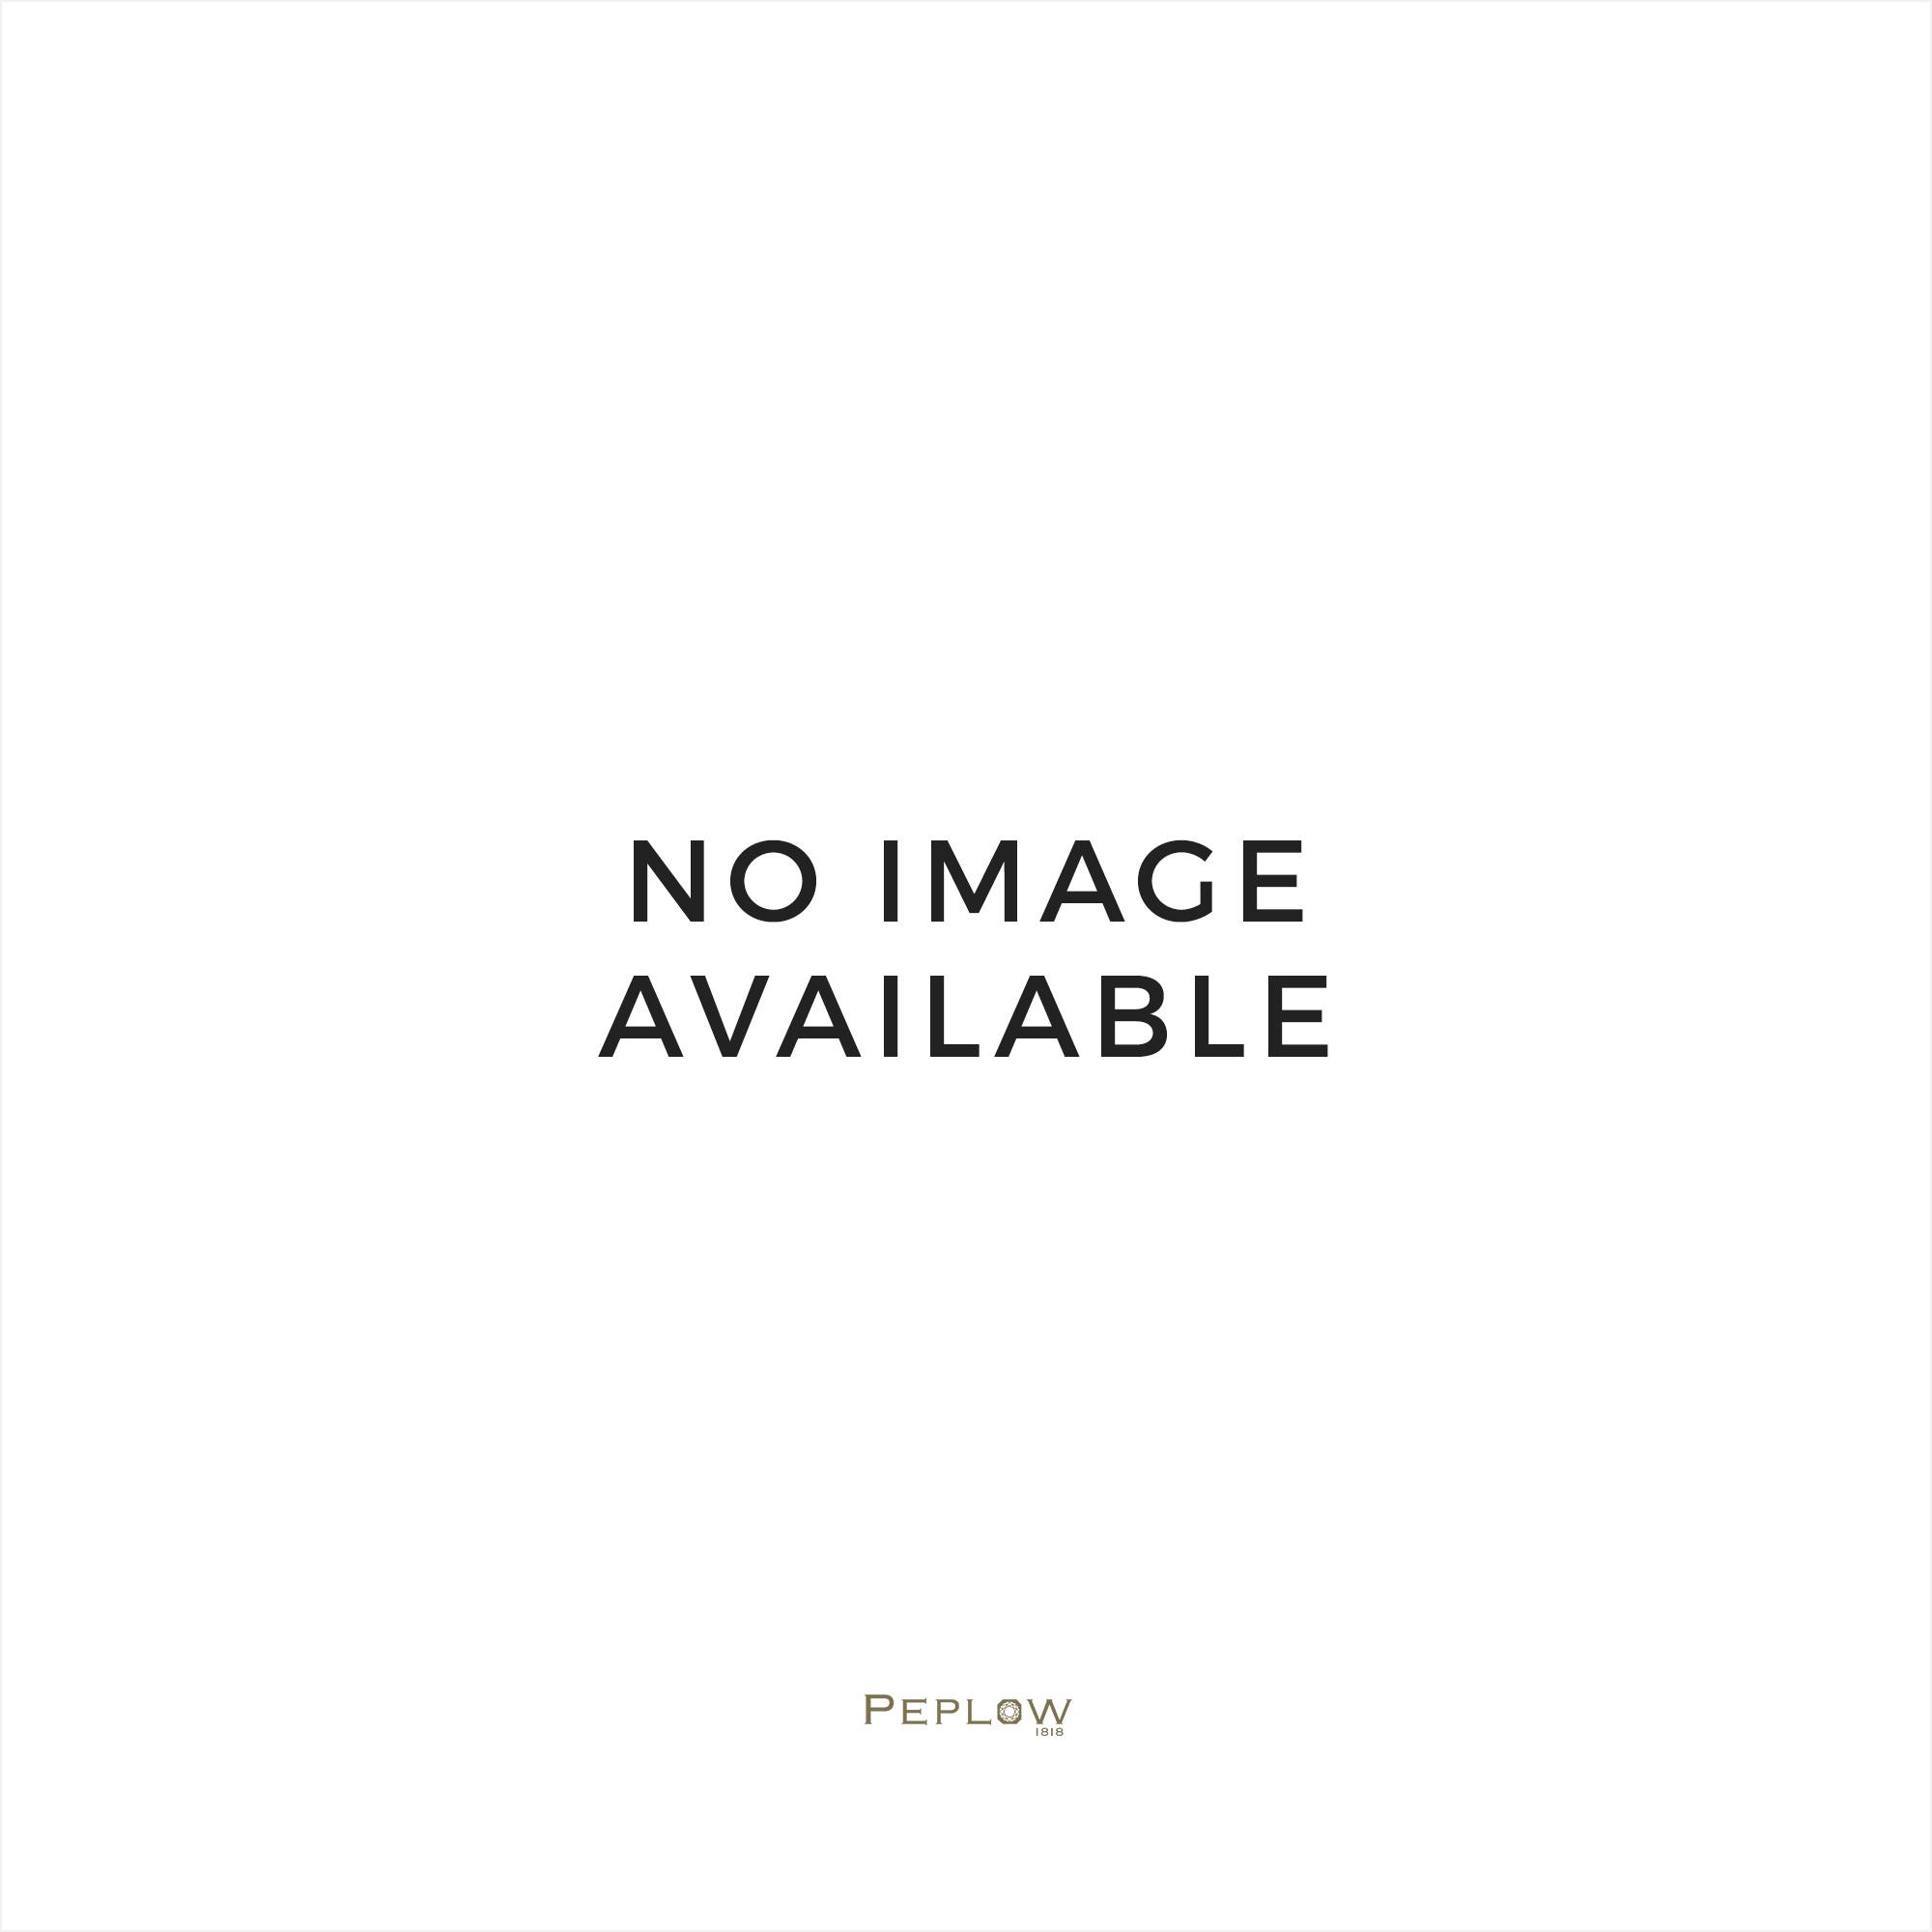 Citizen Watches Citizen Mens Eco-Drive Chronograph Watch CA4234-51E